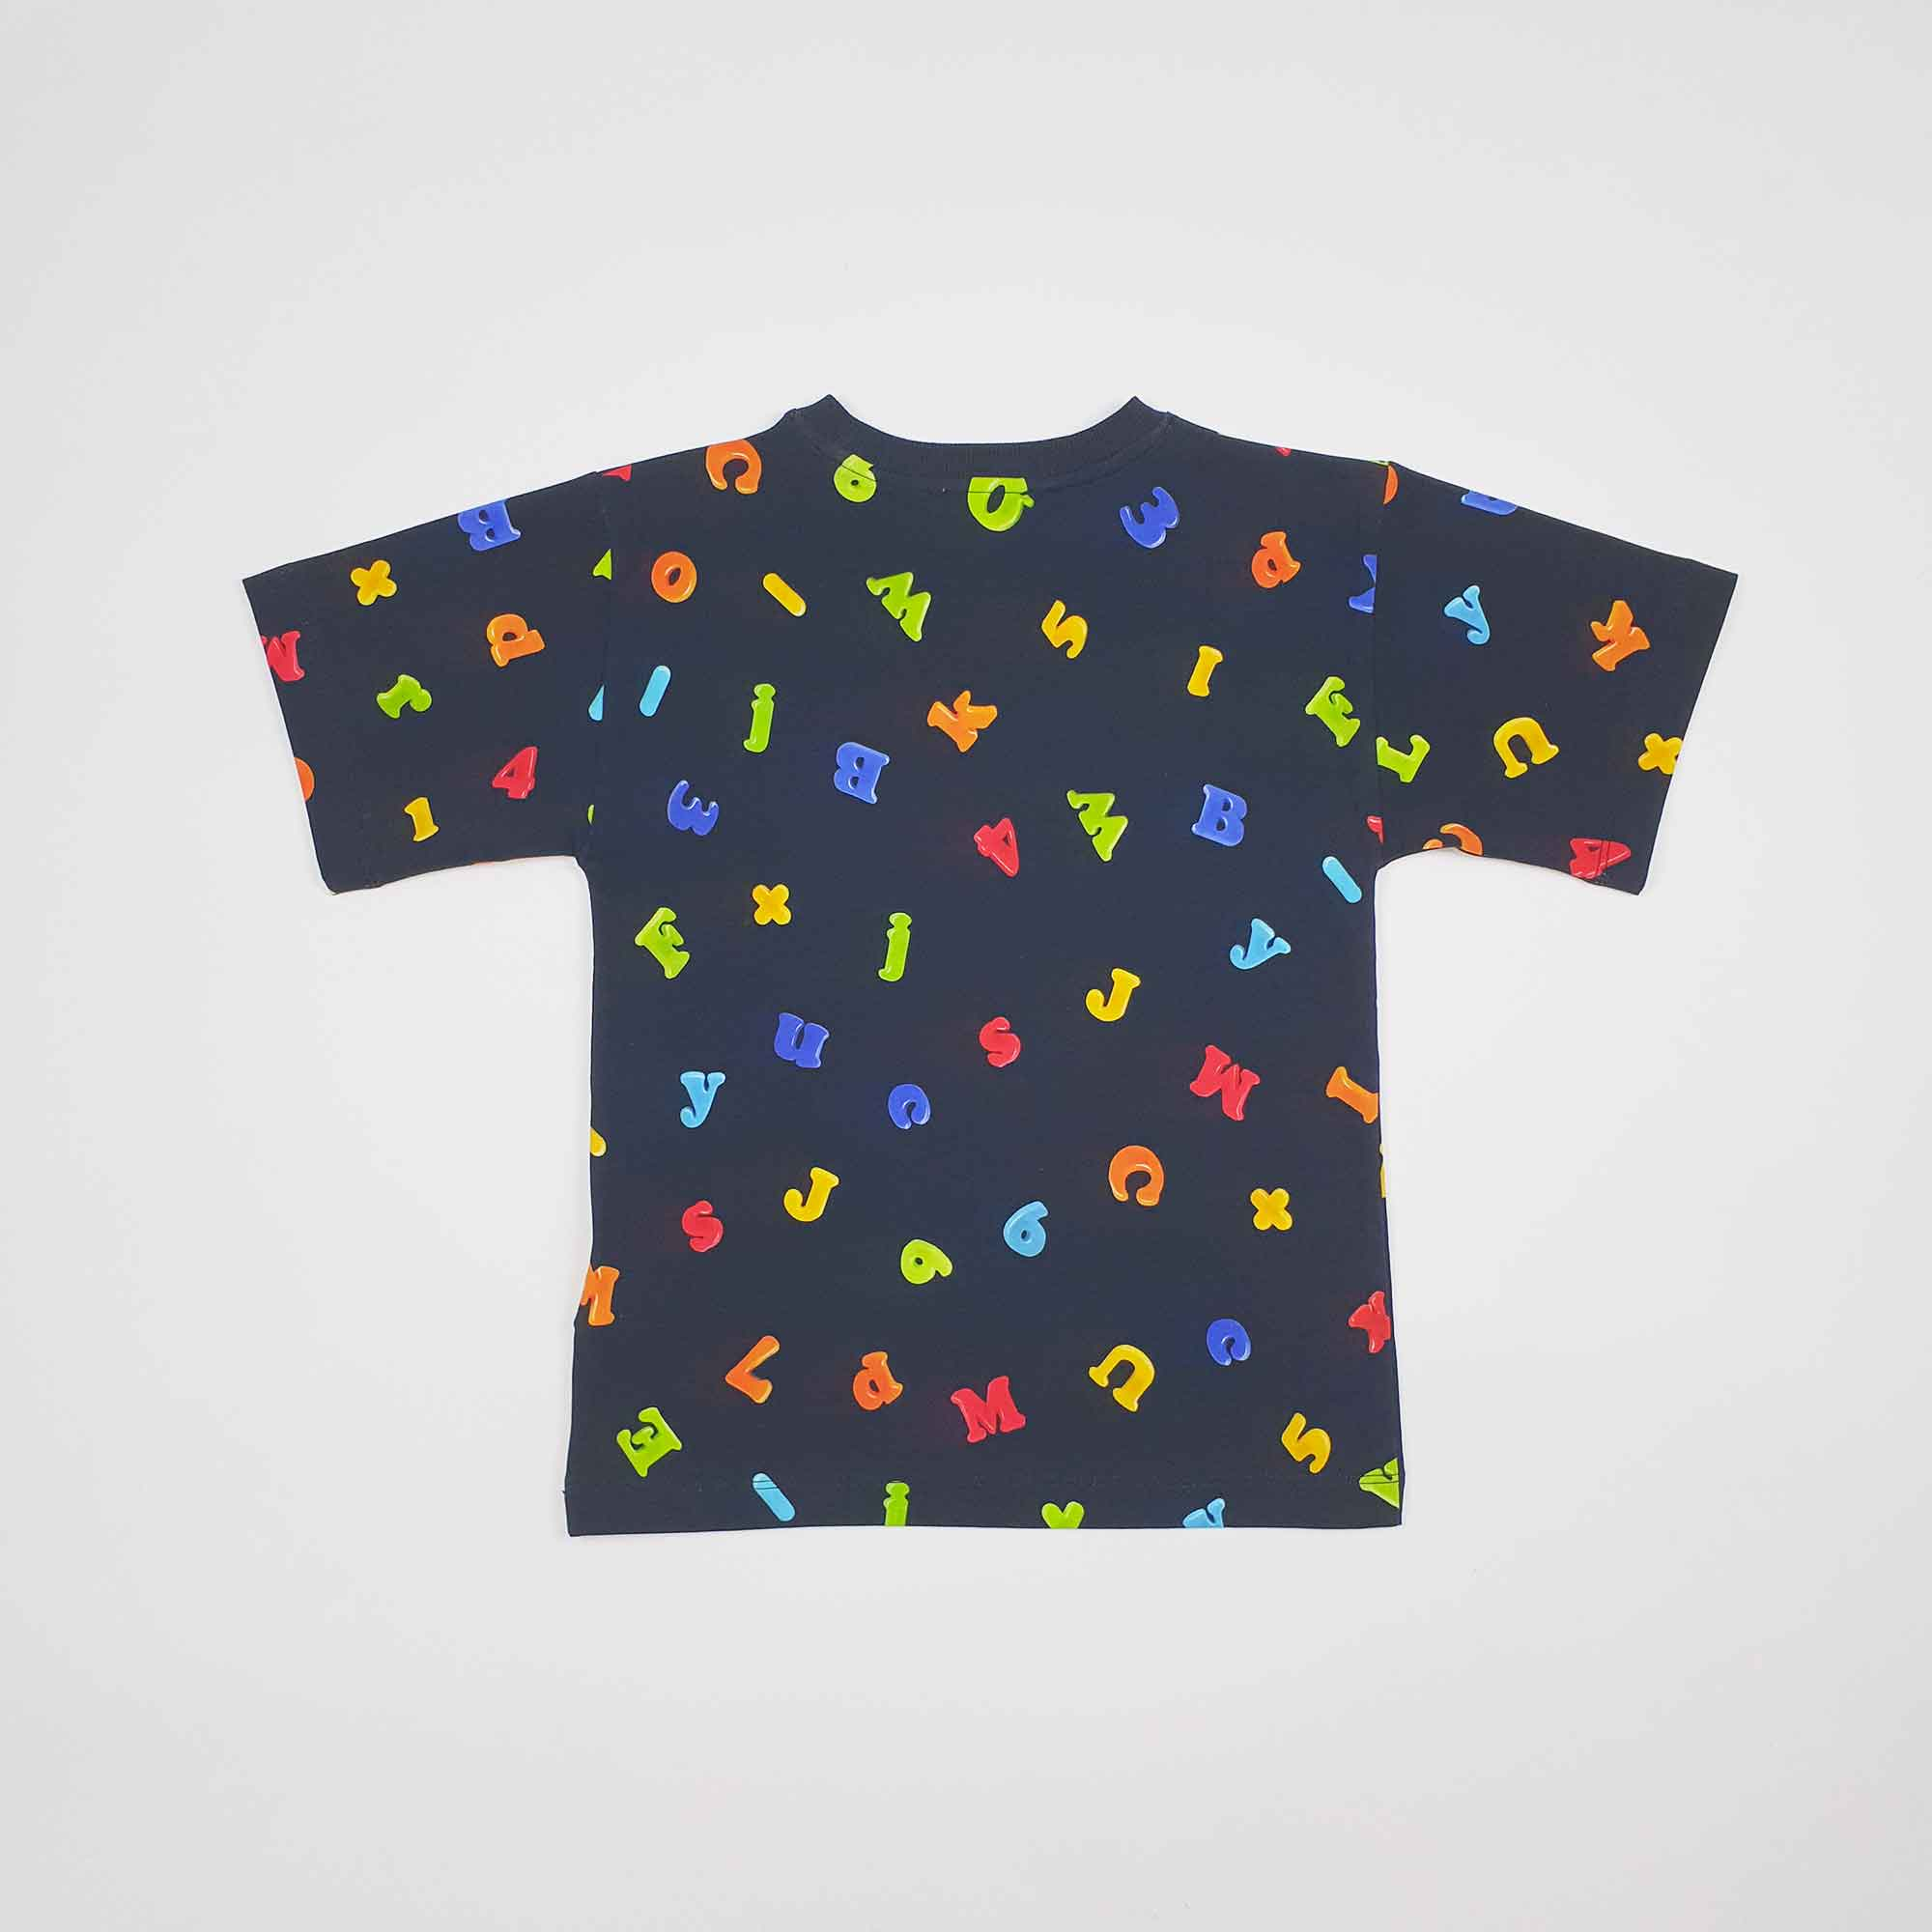 Maxi t-shirt logo lettere - Nero